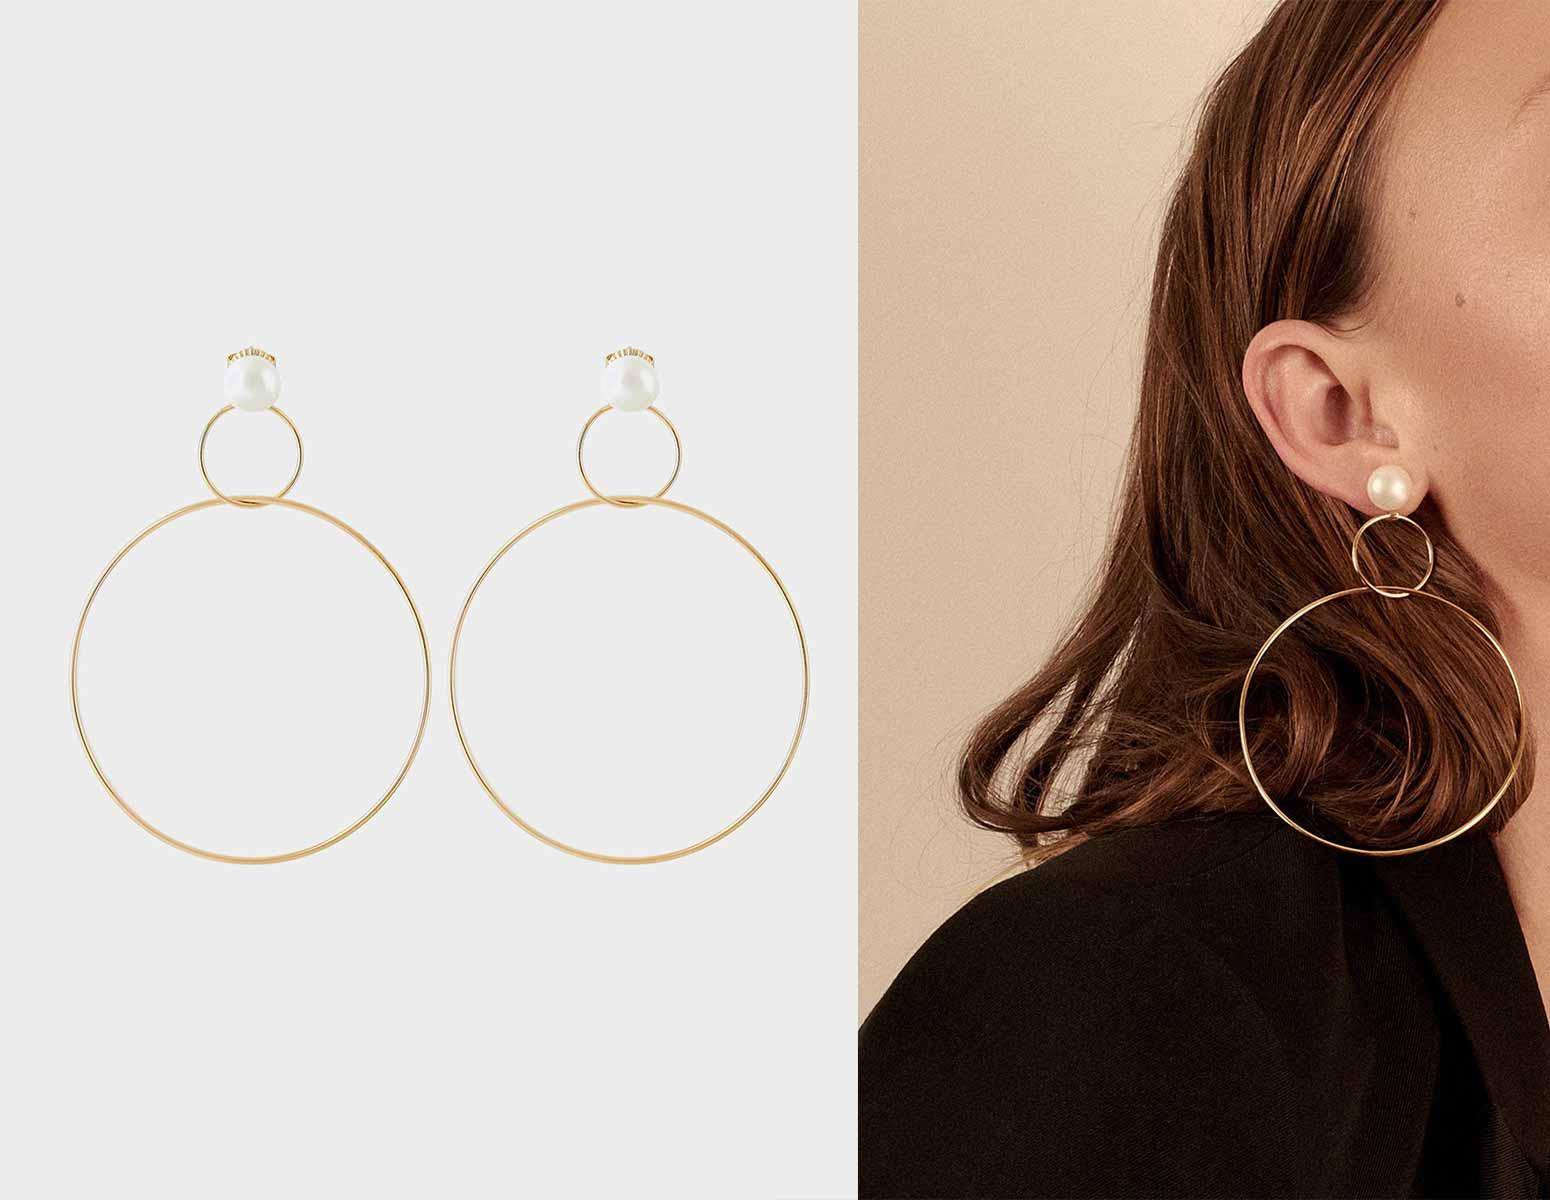 Double Drop Hoop Earrings with Pearl, Runway Jewelry Trends 2019